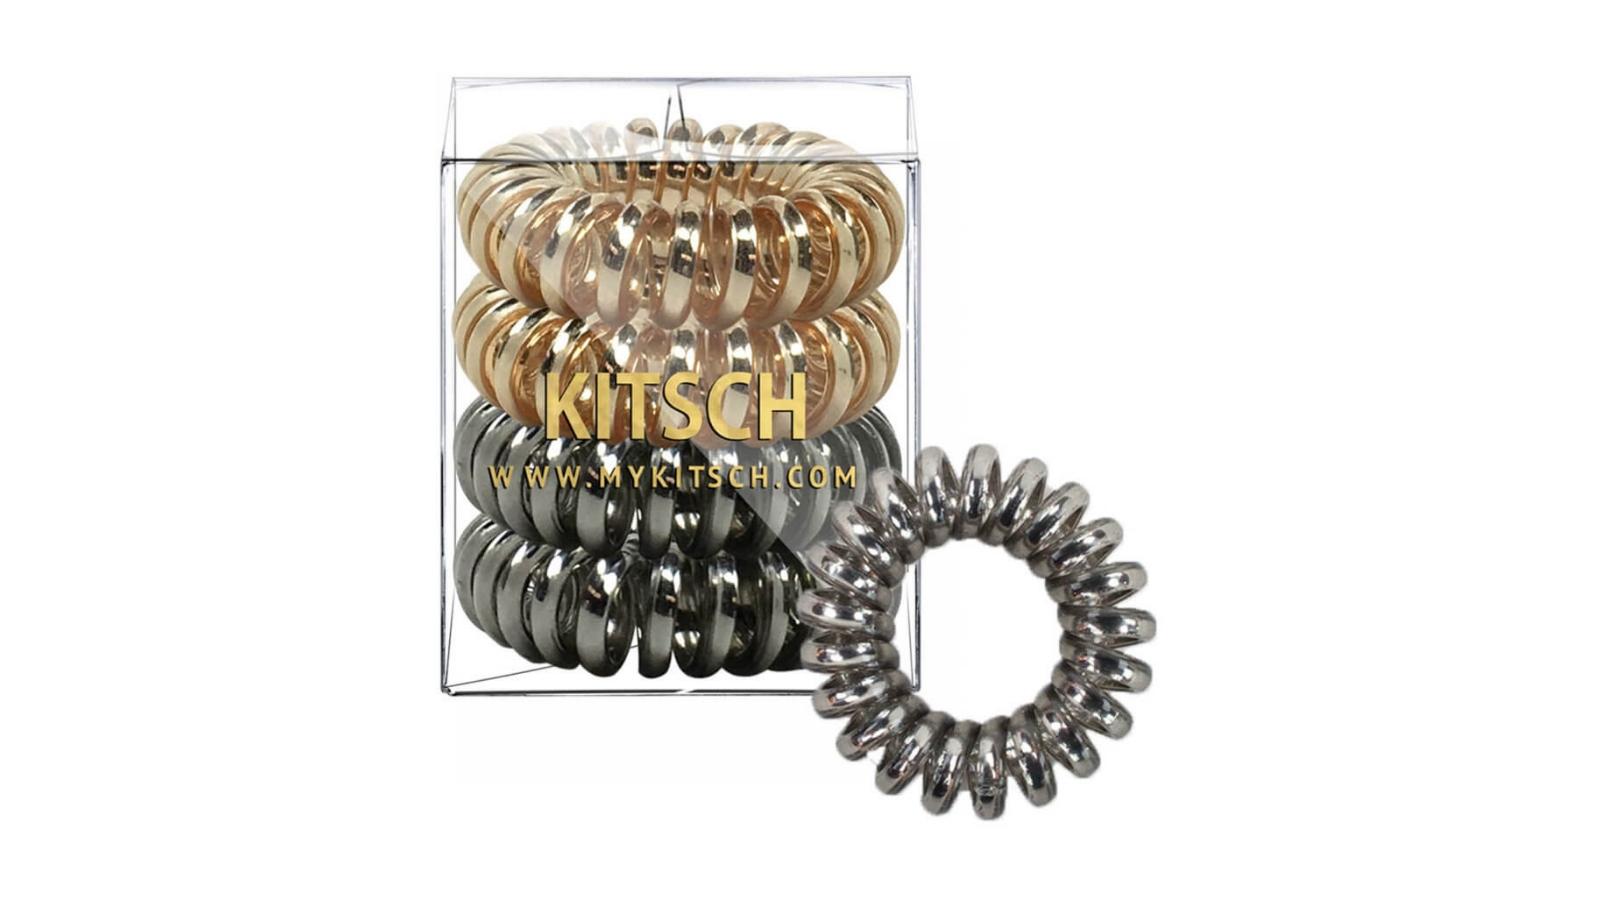 Kitch Metallic Hair Coils $7